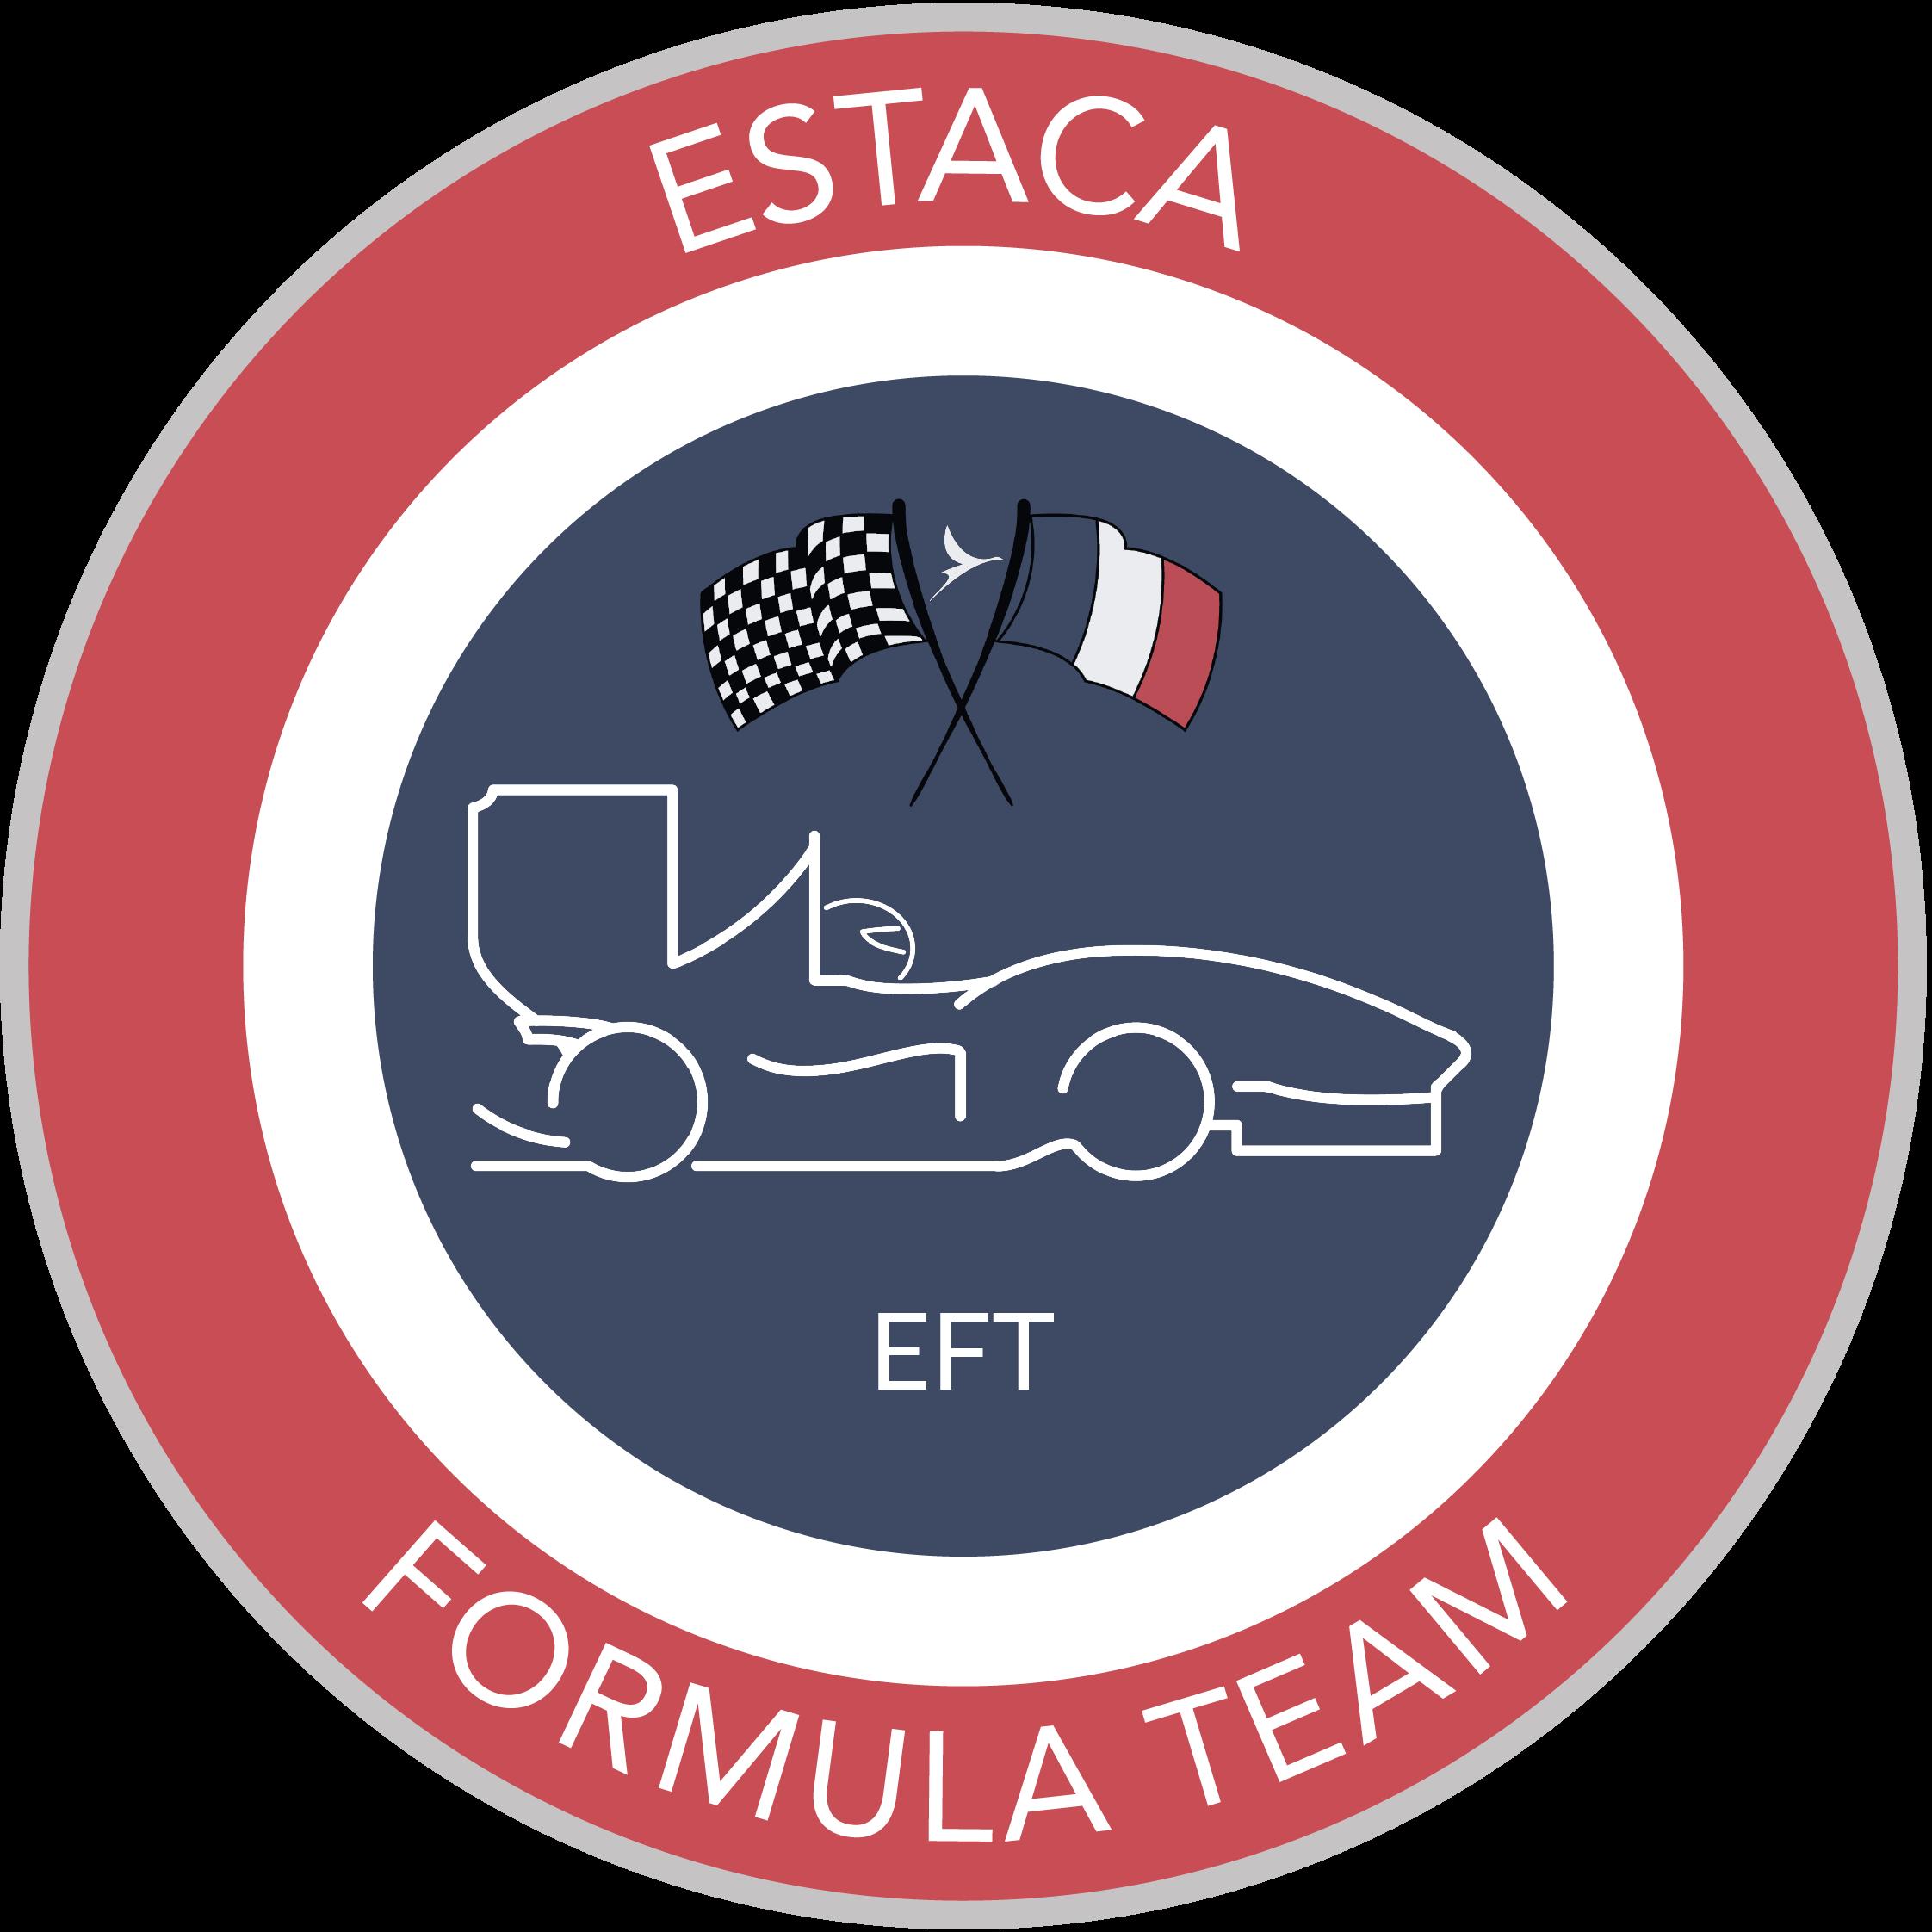 ESTACA Formula Team